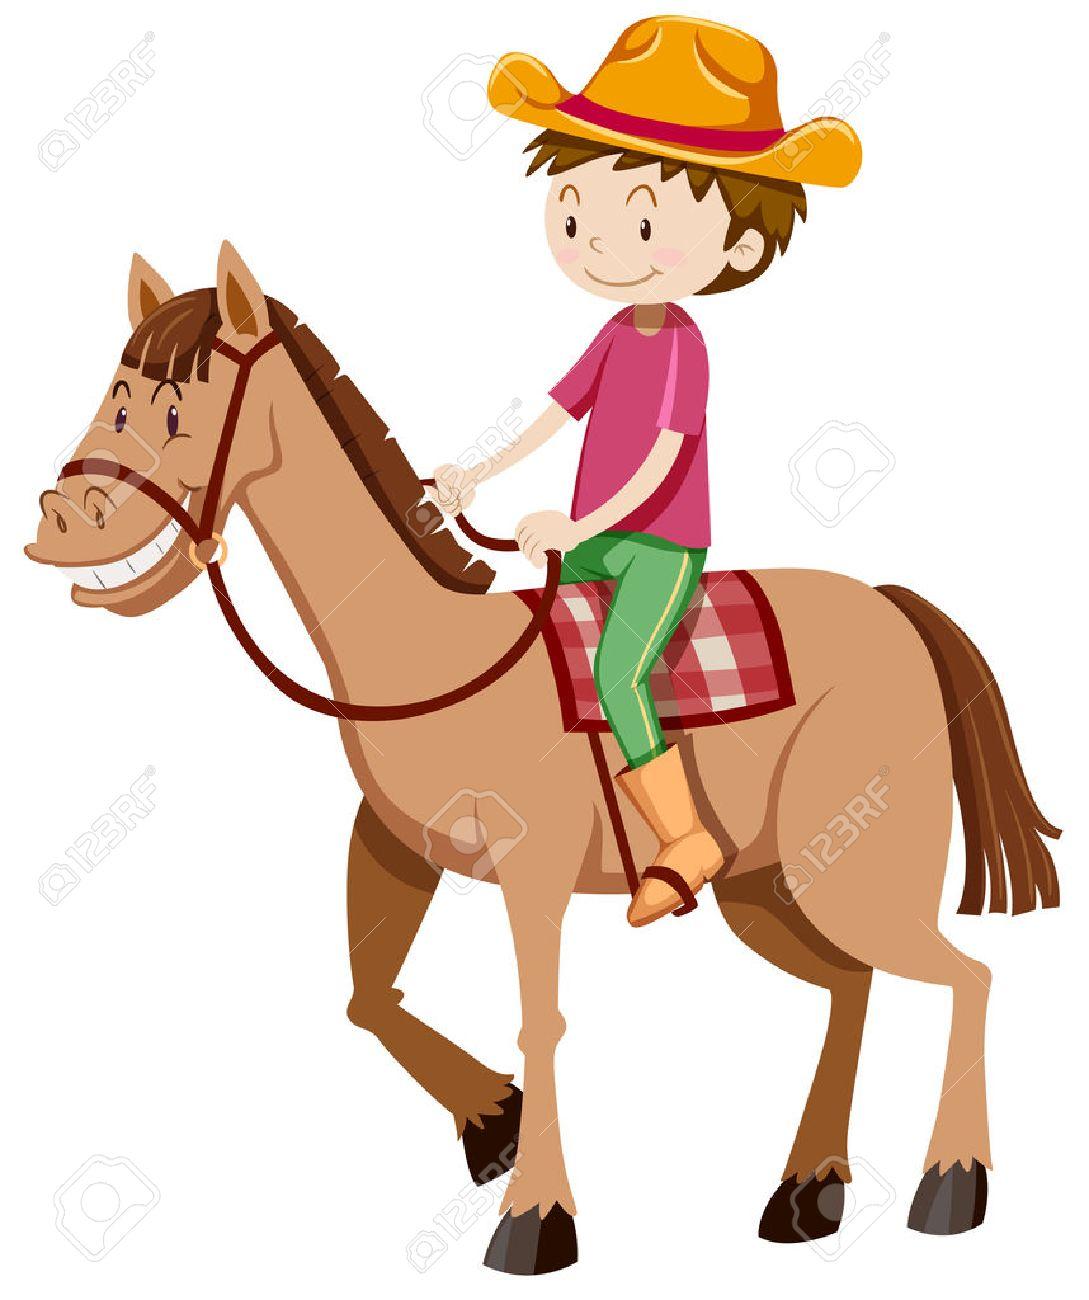 1089x1300 Ride A Horse Clipart Horse Riding Clipart 1